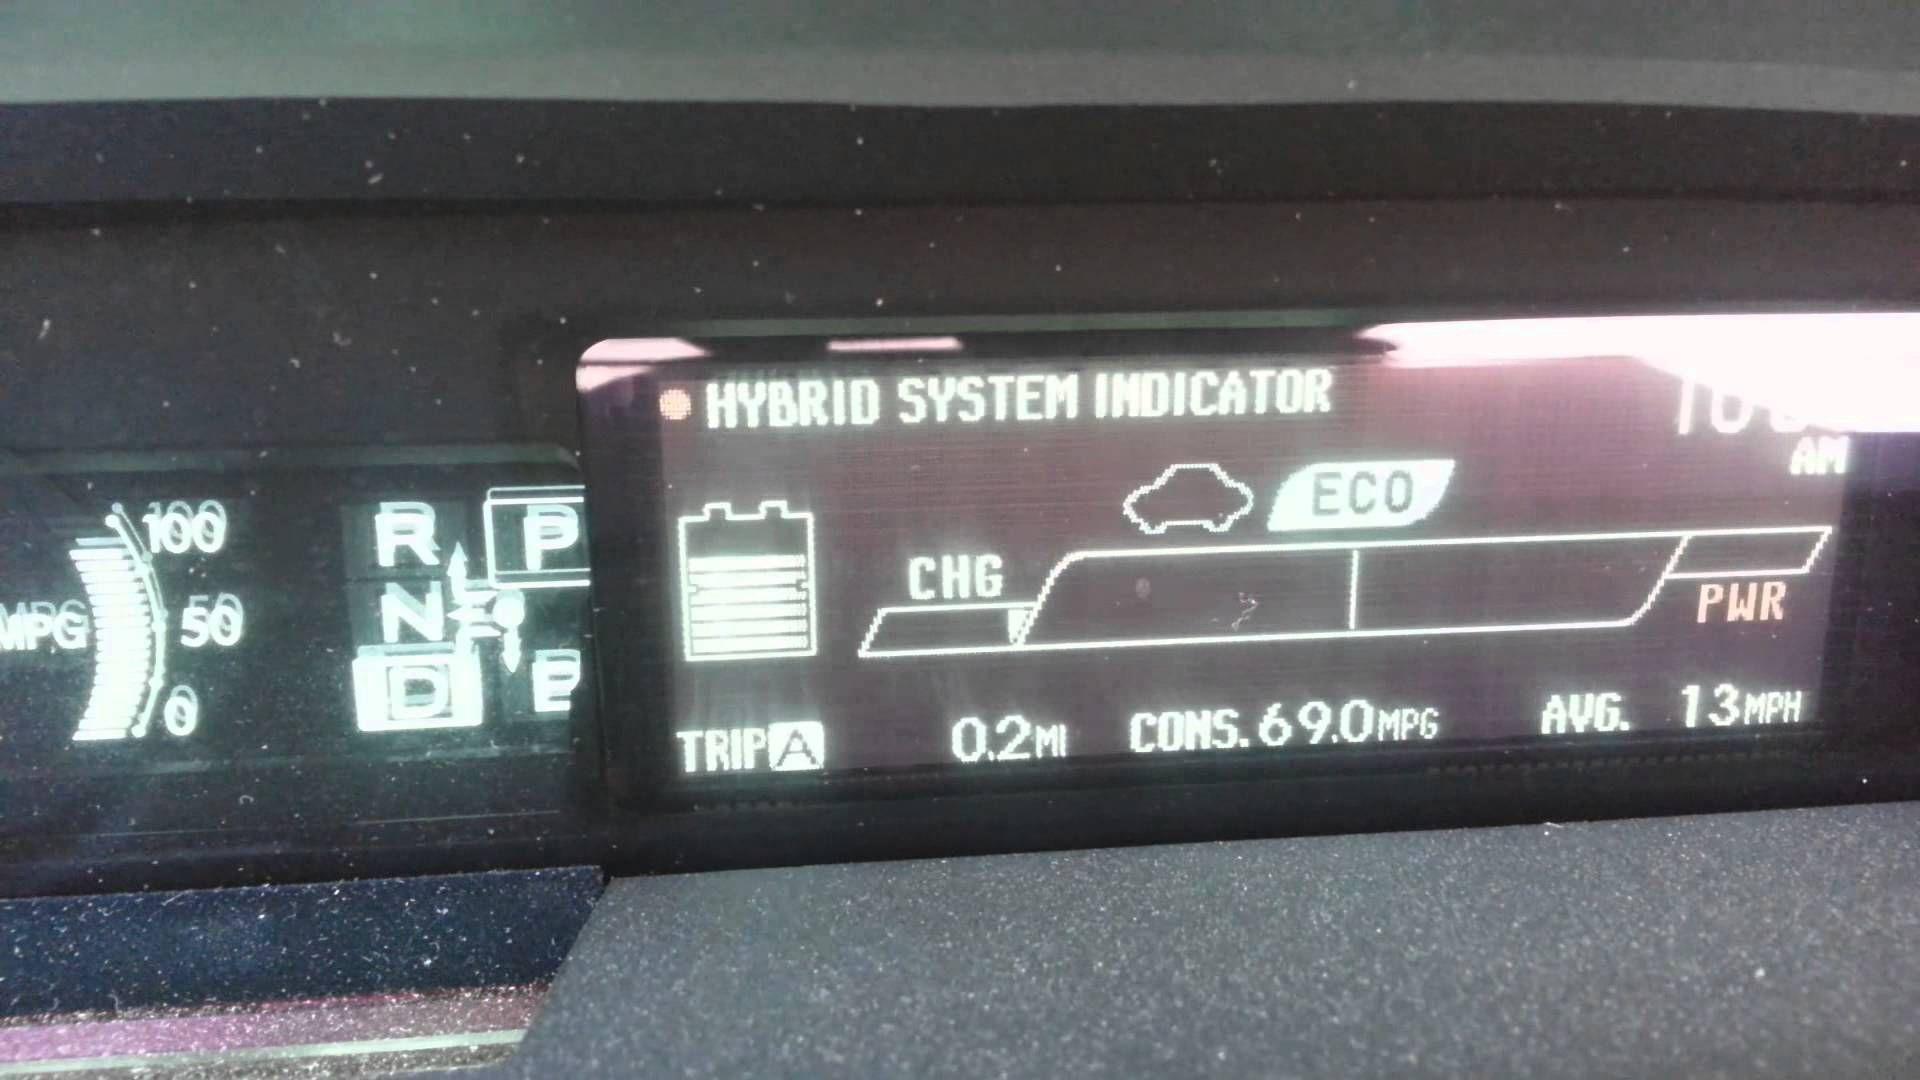 Toyota Prius Instrument panel explained Detailed Gen 4